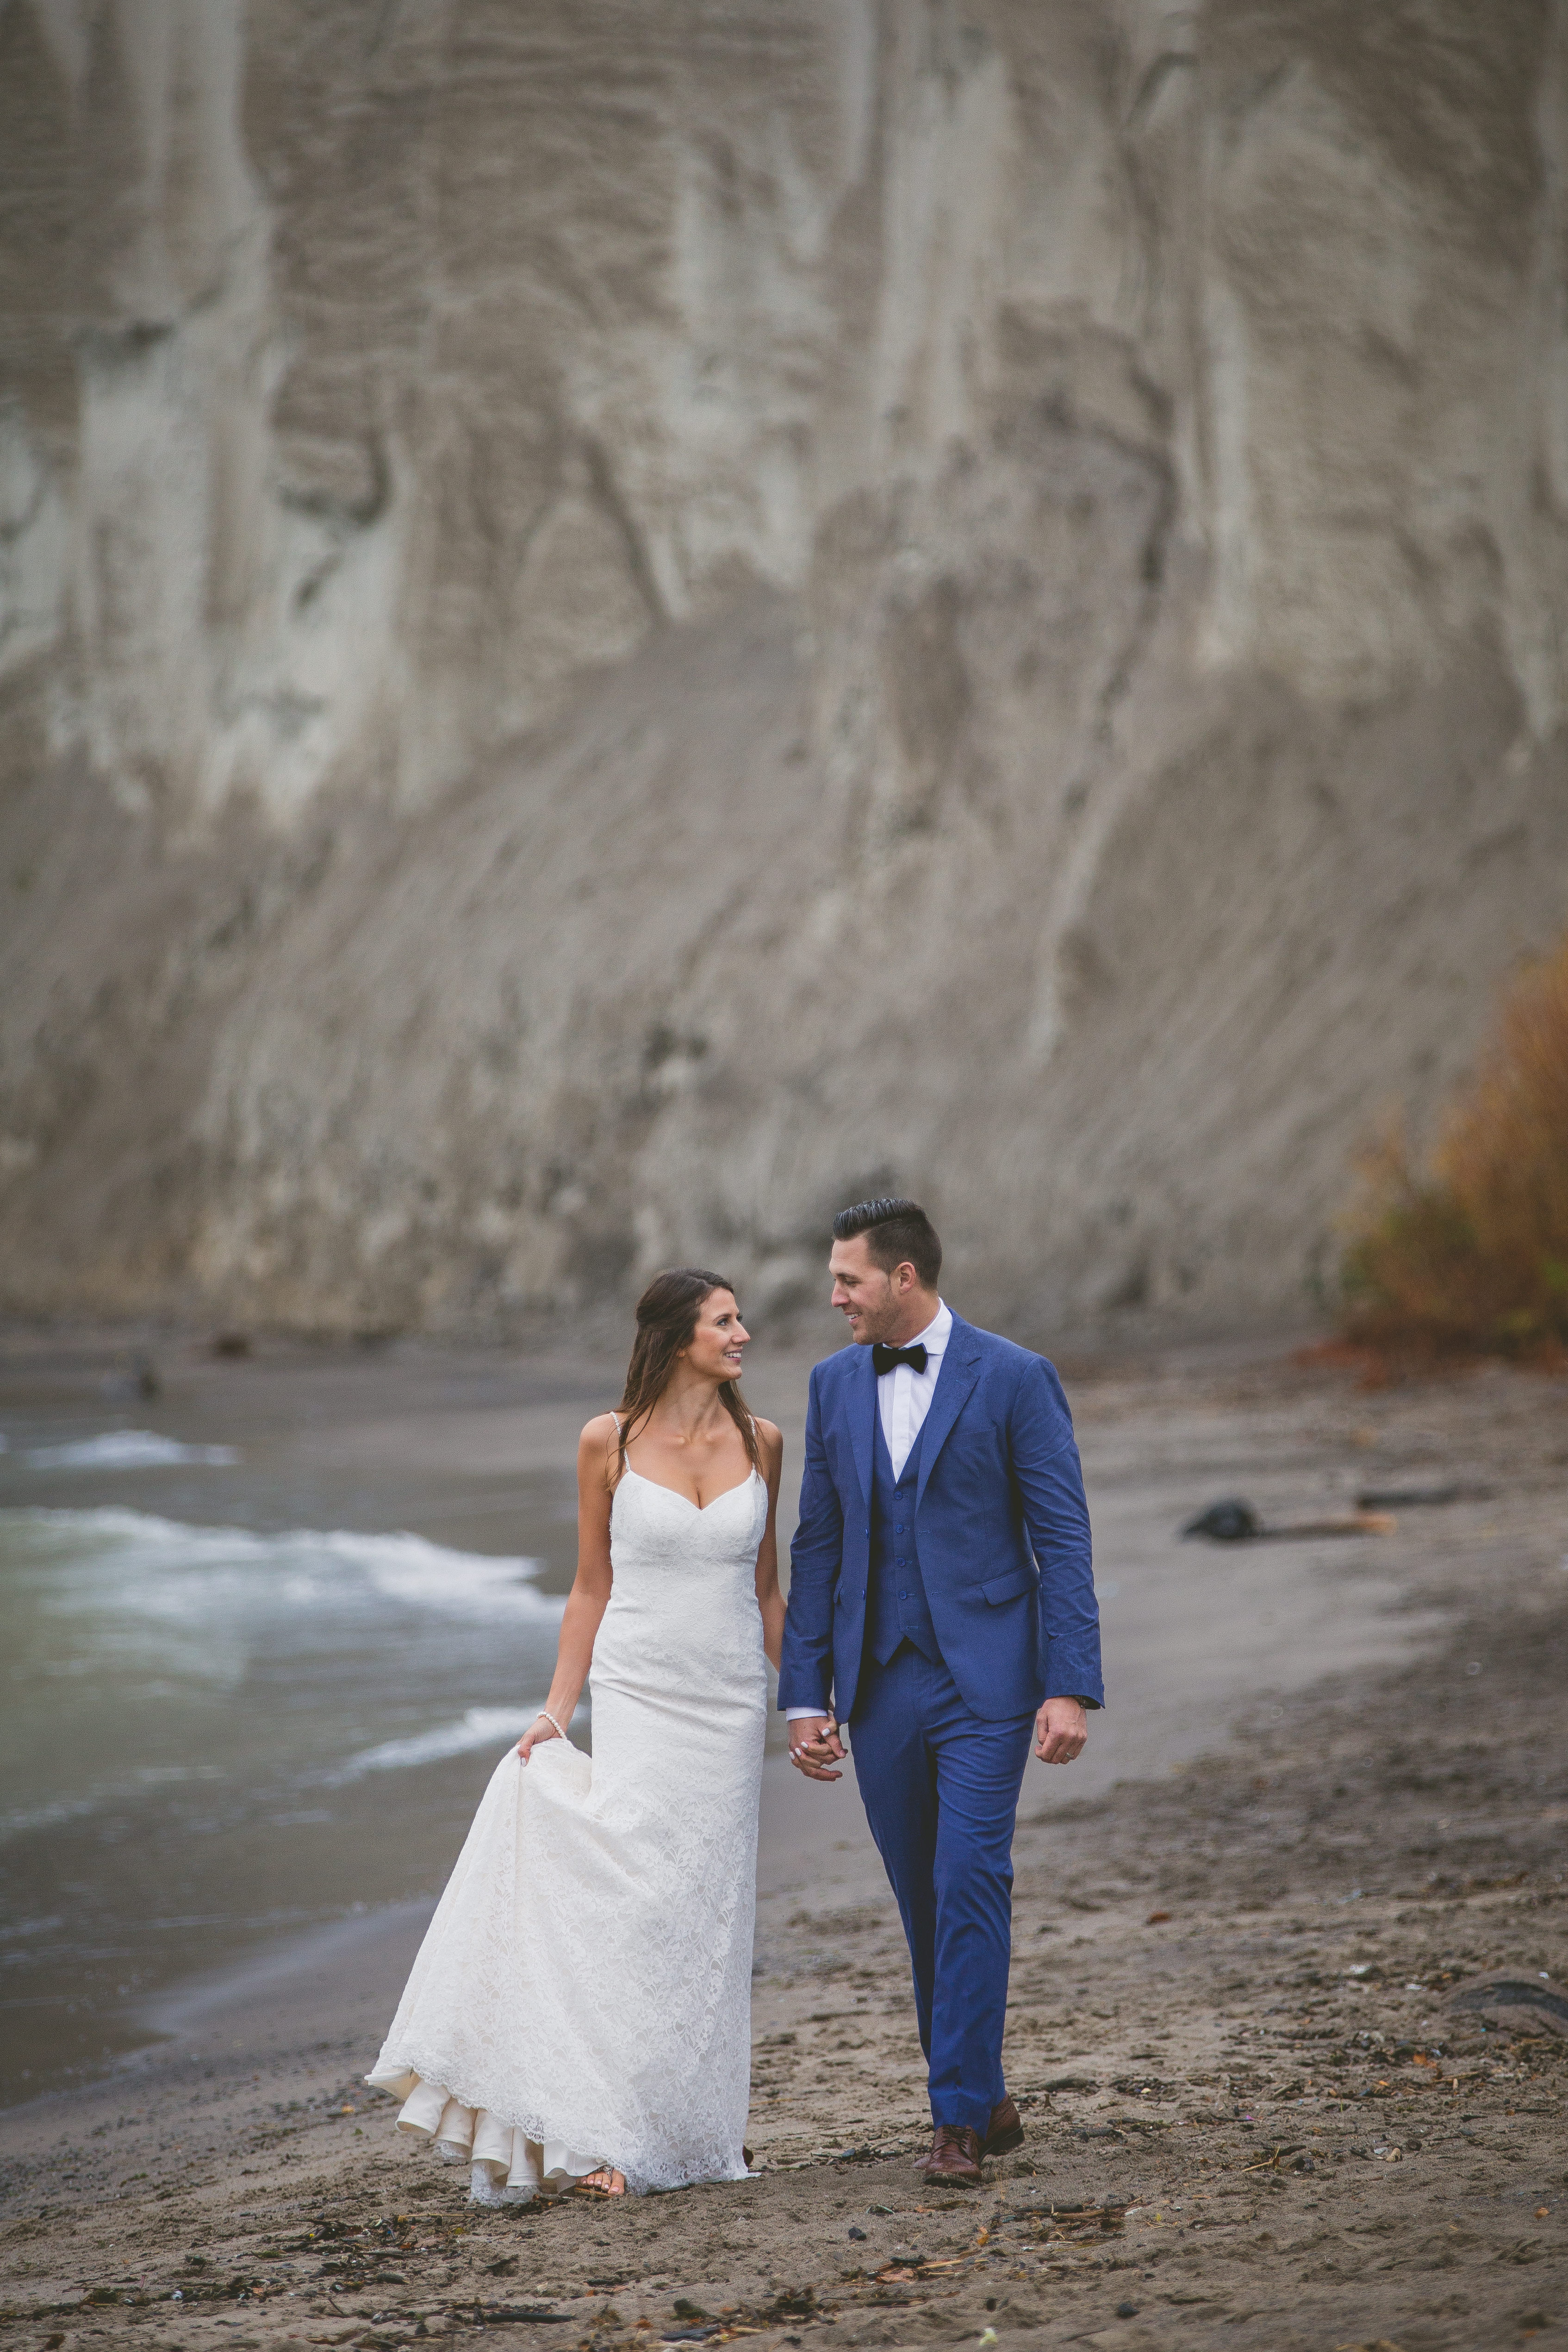 scarborough bluffs wedding photos 66 - Scarborough Bluffs Wedding Photos